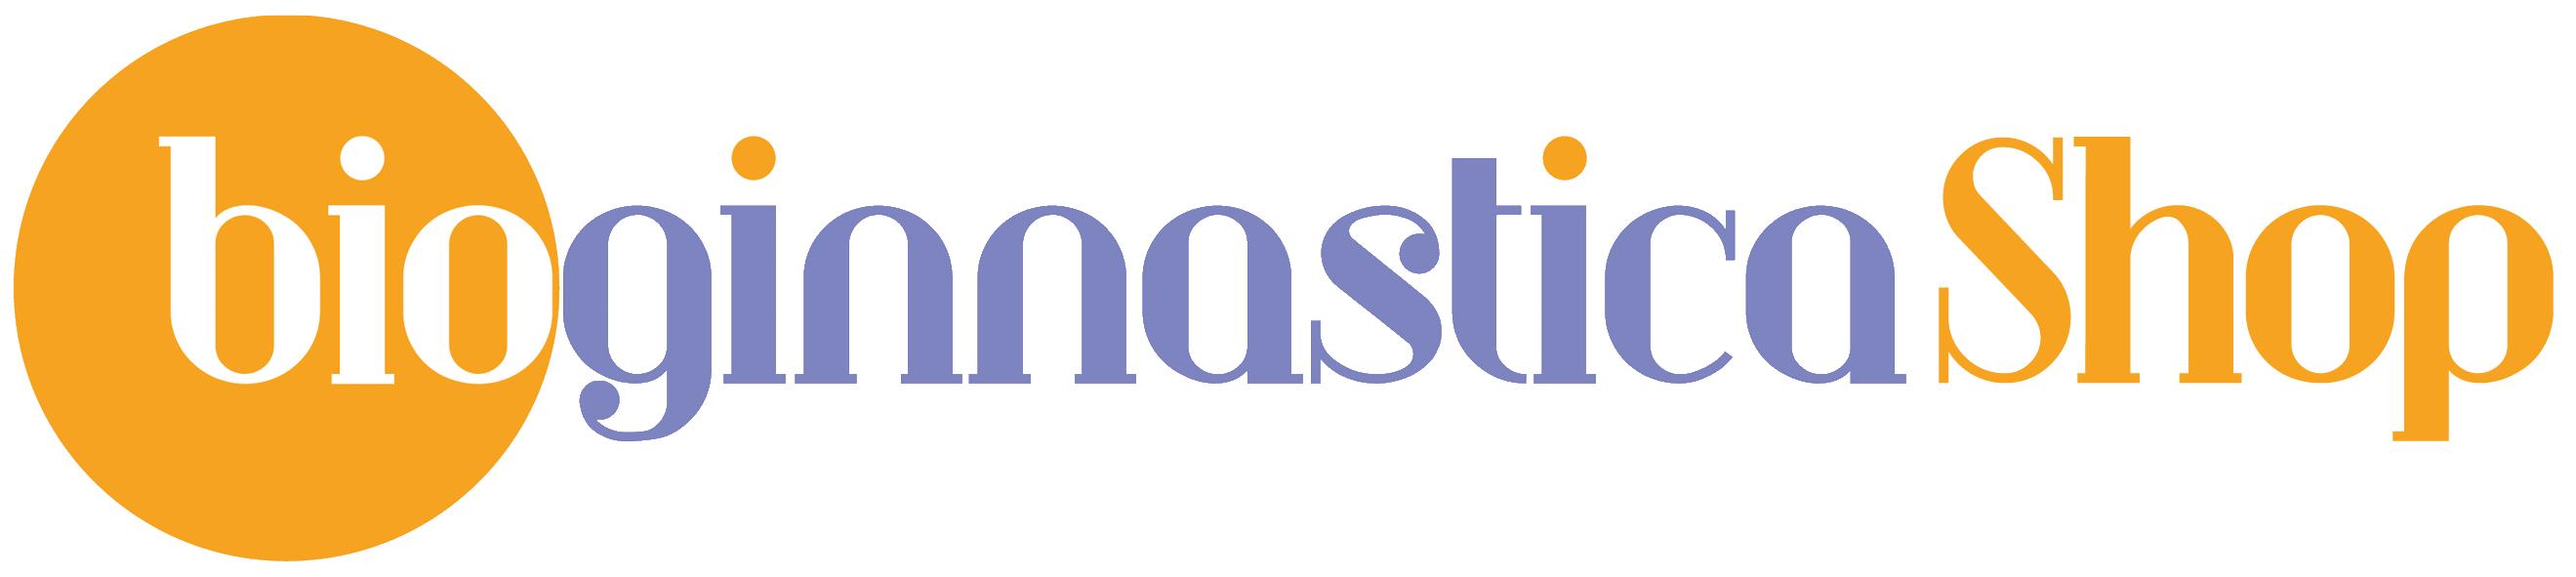 BioginnasticaShop logo